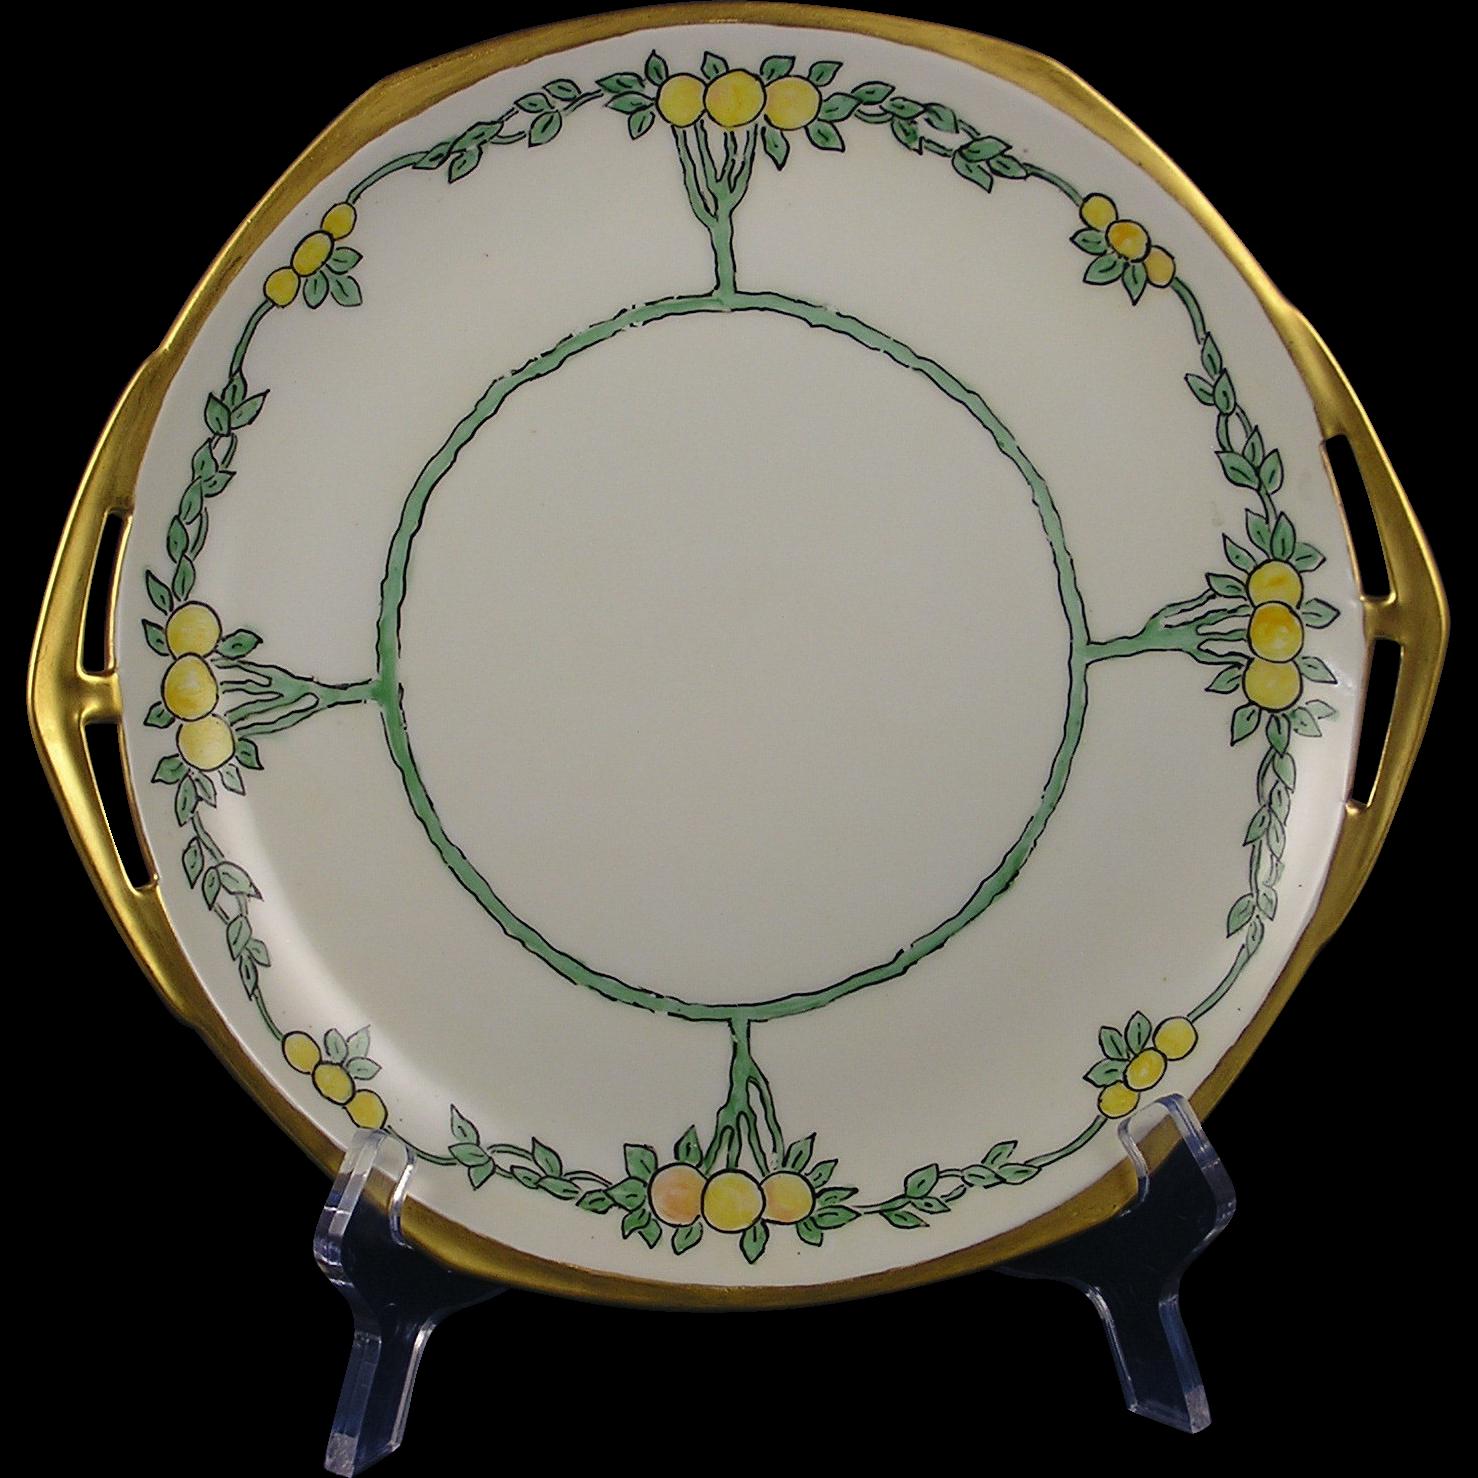 "Moritz Zdekauer (MZ) Altrohlau Czechoslovakia Arts & Crafts Citrus Tree Motif Handled Plate (Signed ""EHR""/c.1918-1939)"